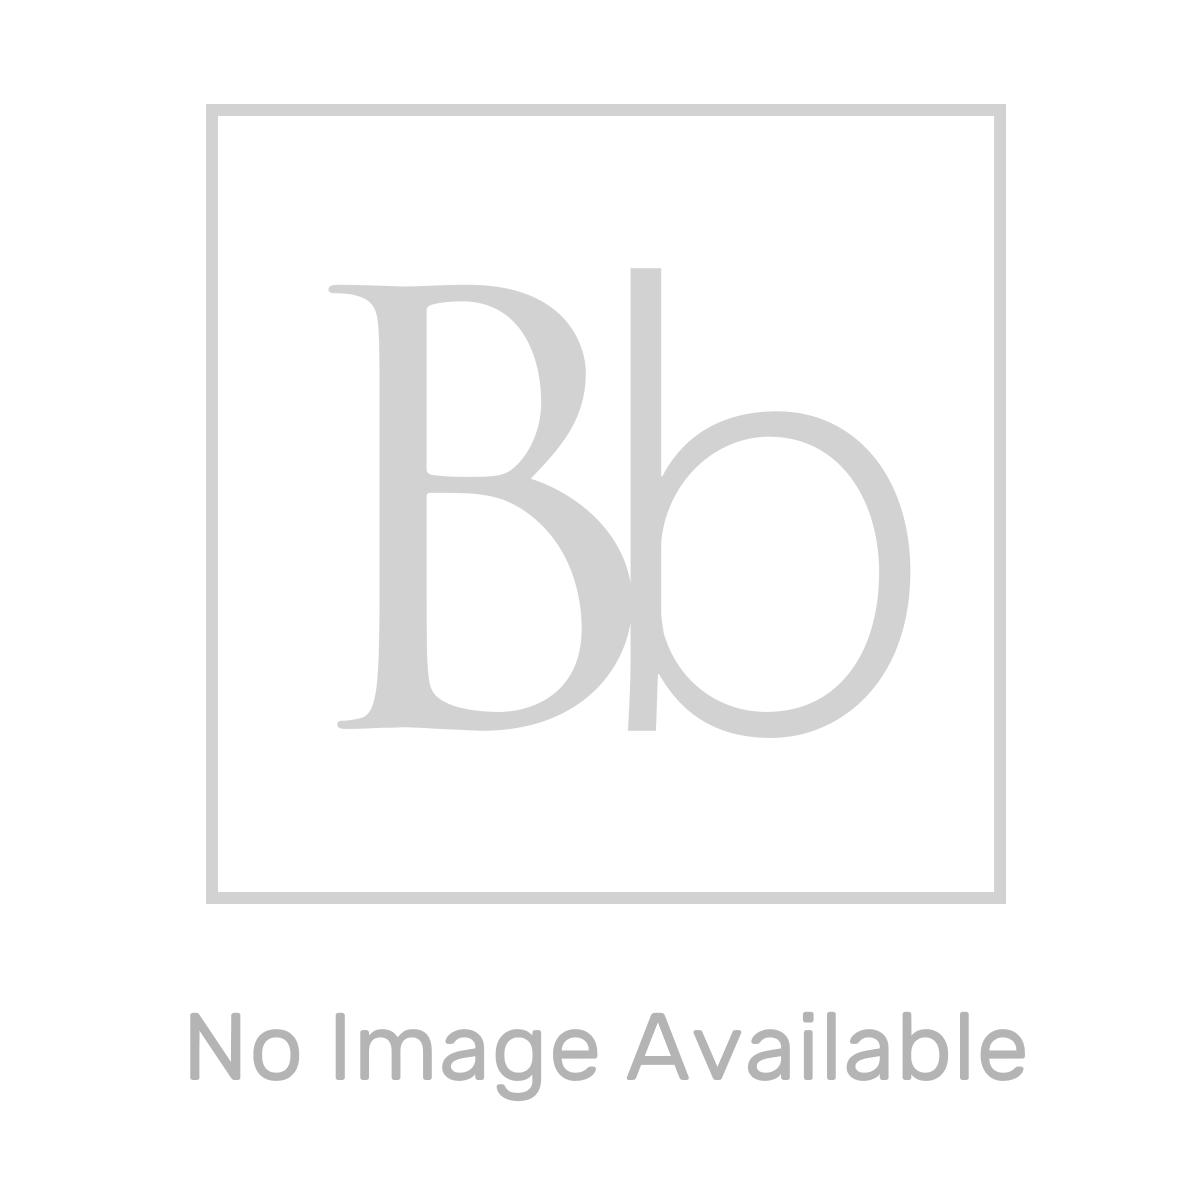 Frontline Standard Rectanglular Shower Tray 1000 x 700mm